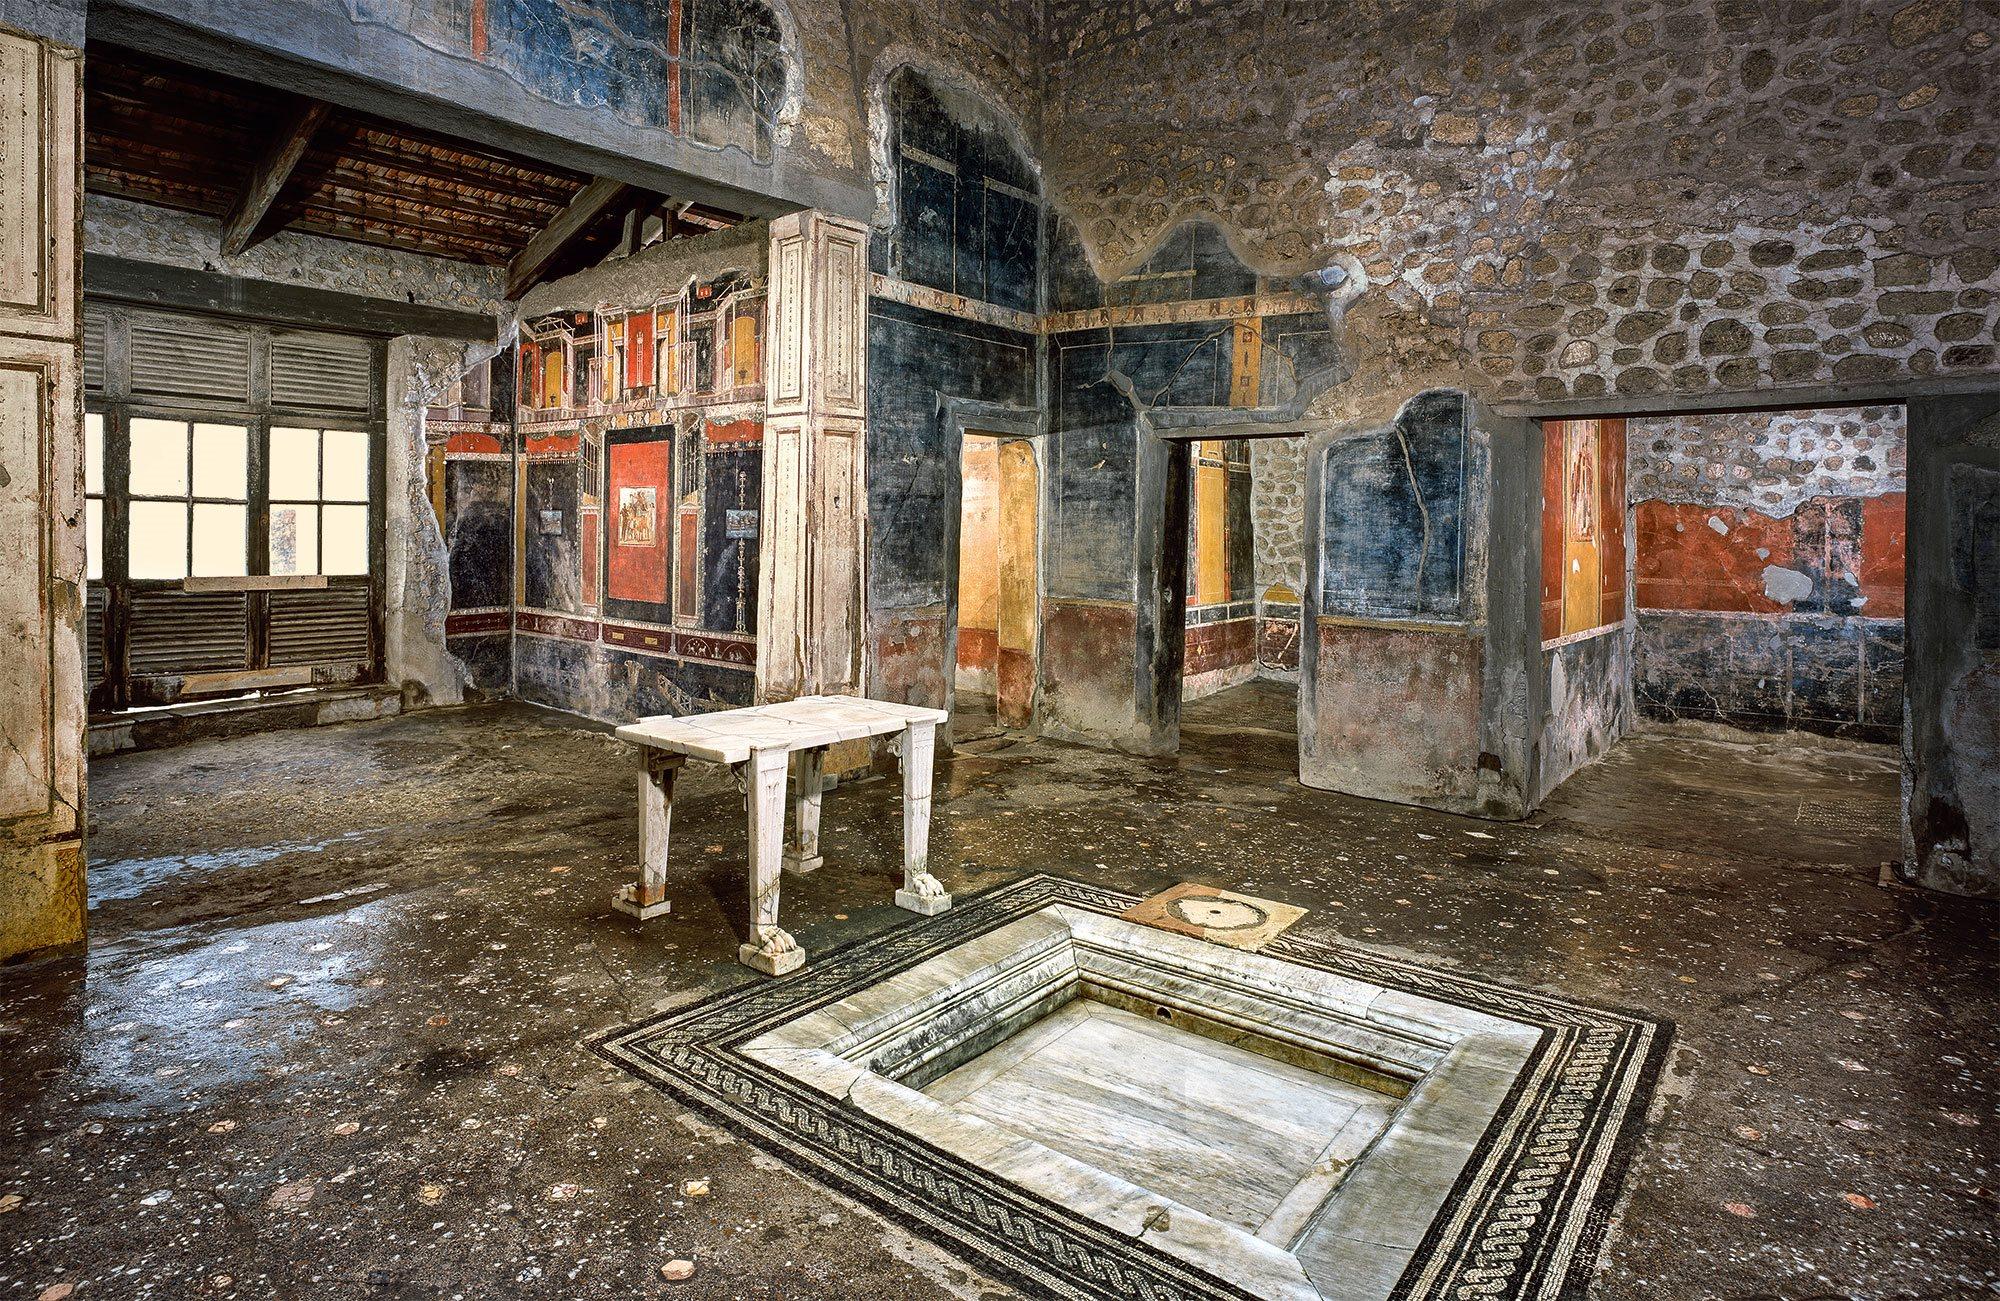 Muebles Pompeya - Domus Pompeya La T Nica De Neso P Gina 2[mjhdah]https://http2.mlstatic.com/dos-alacenas-individuales-D_NQ_NP_790523-MLA26635002065_012018-F.jpg